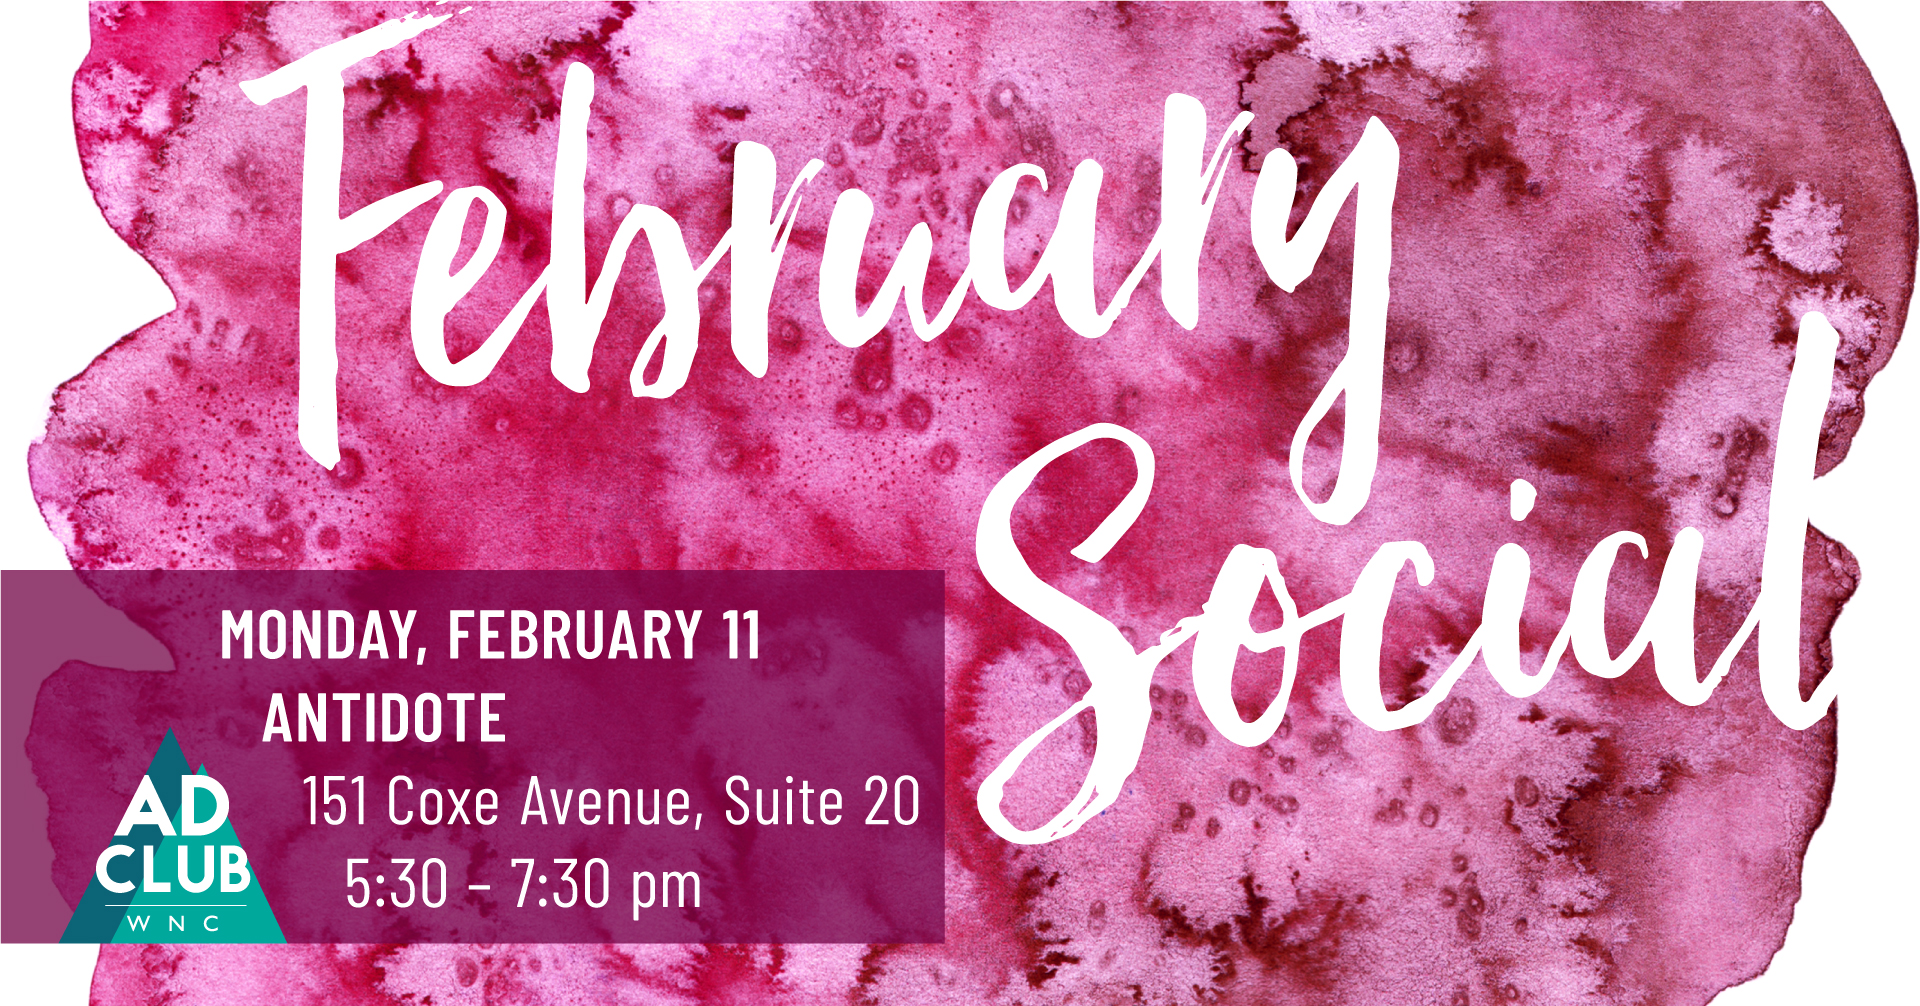 Ad_Club_2019_february_Social_FB_event.jpg